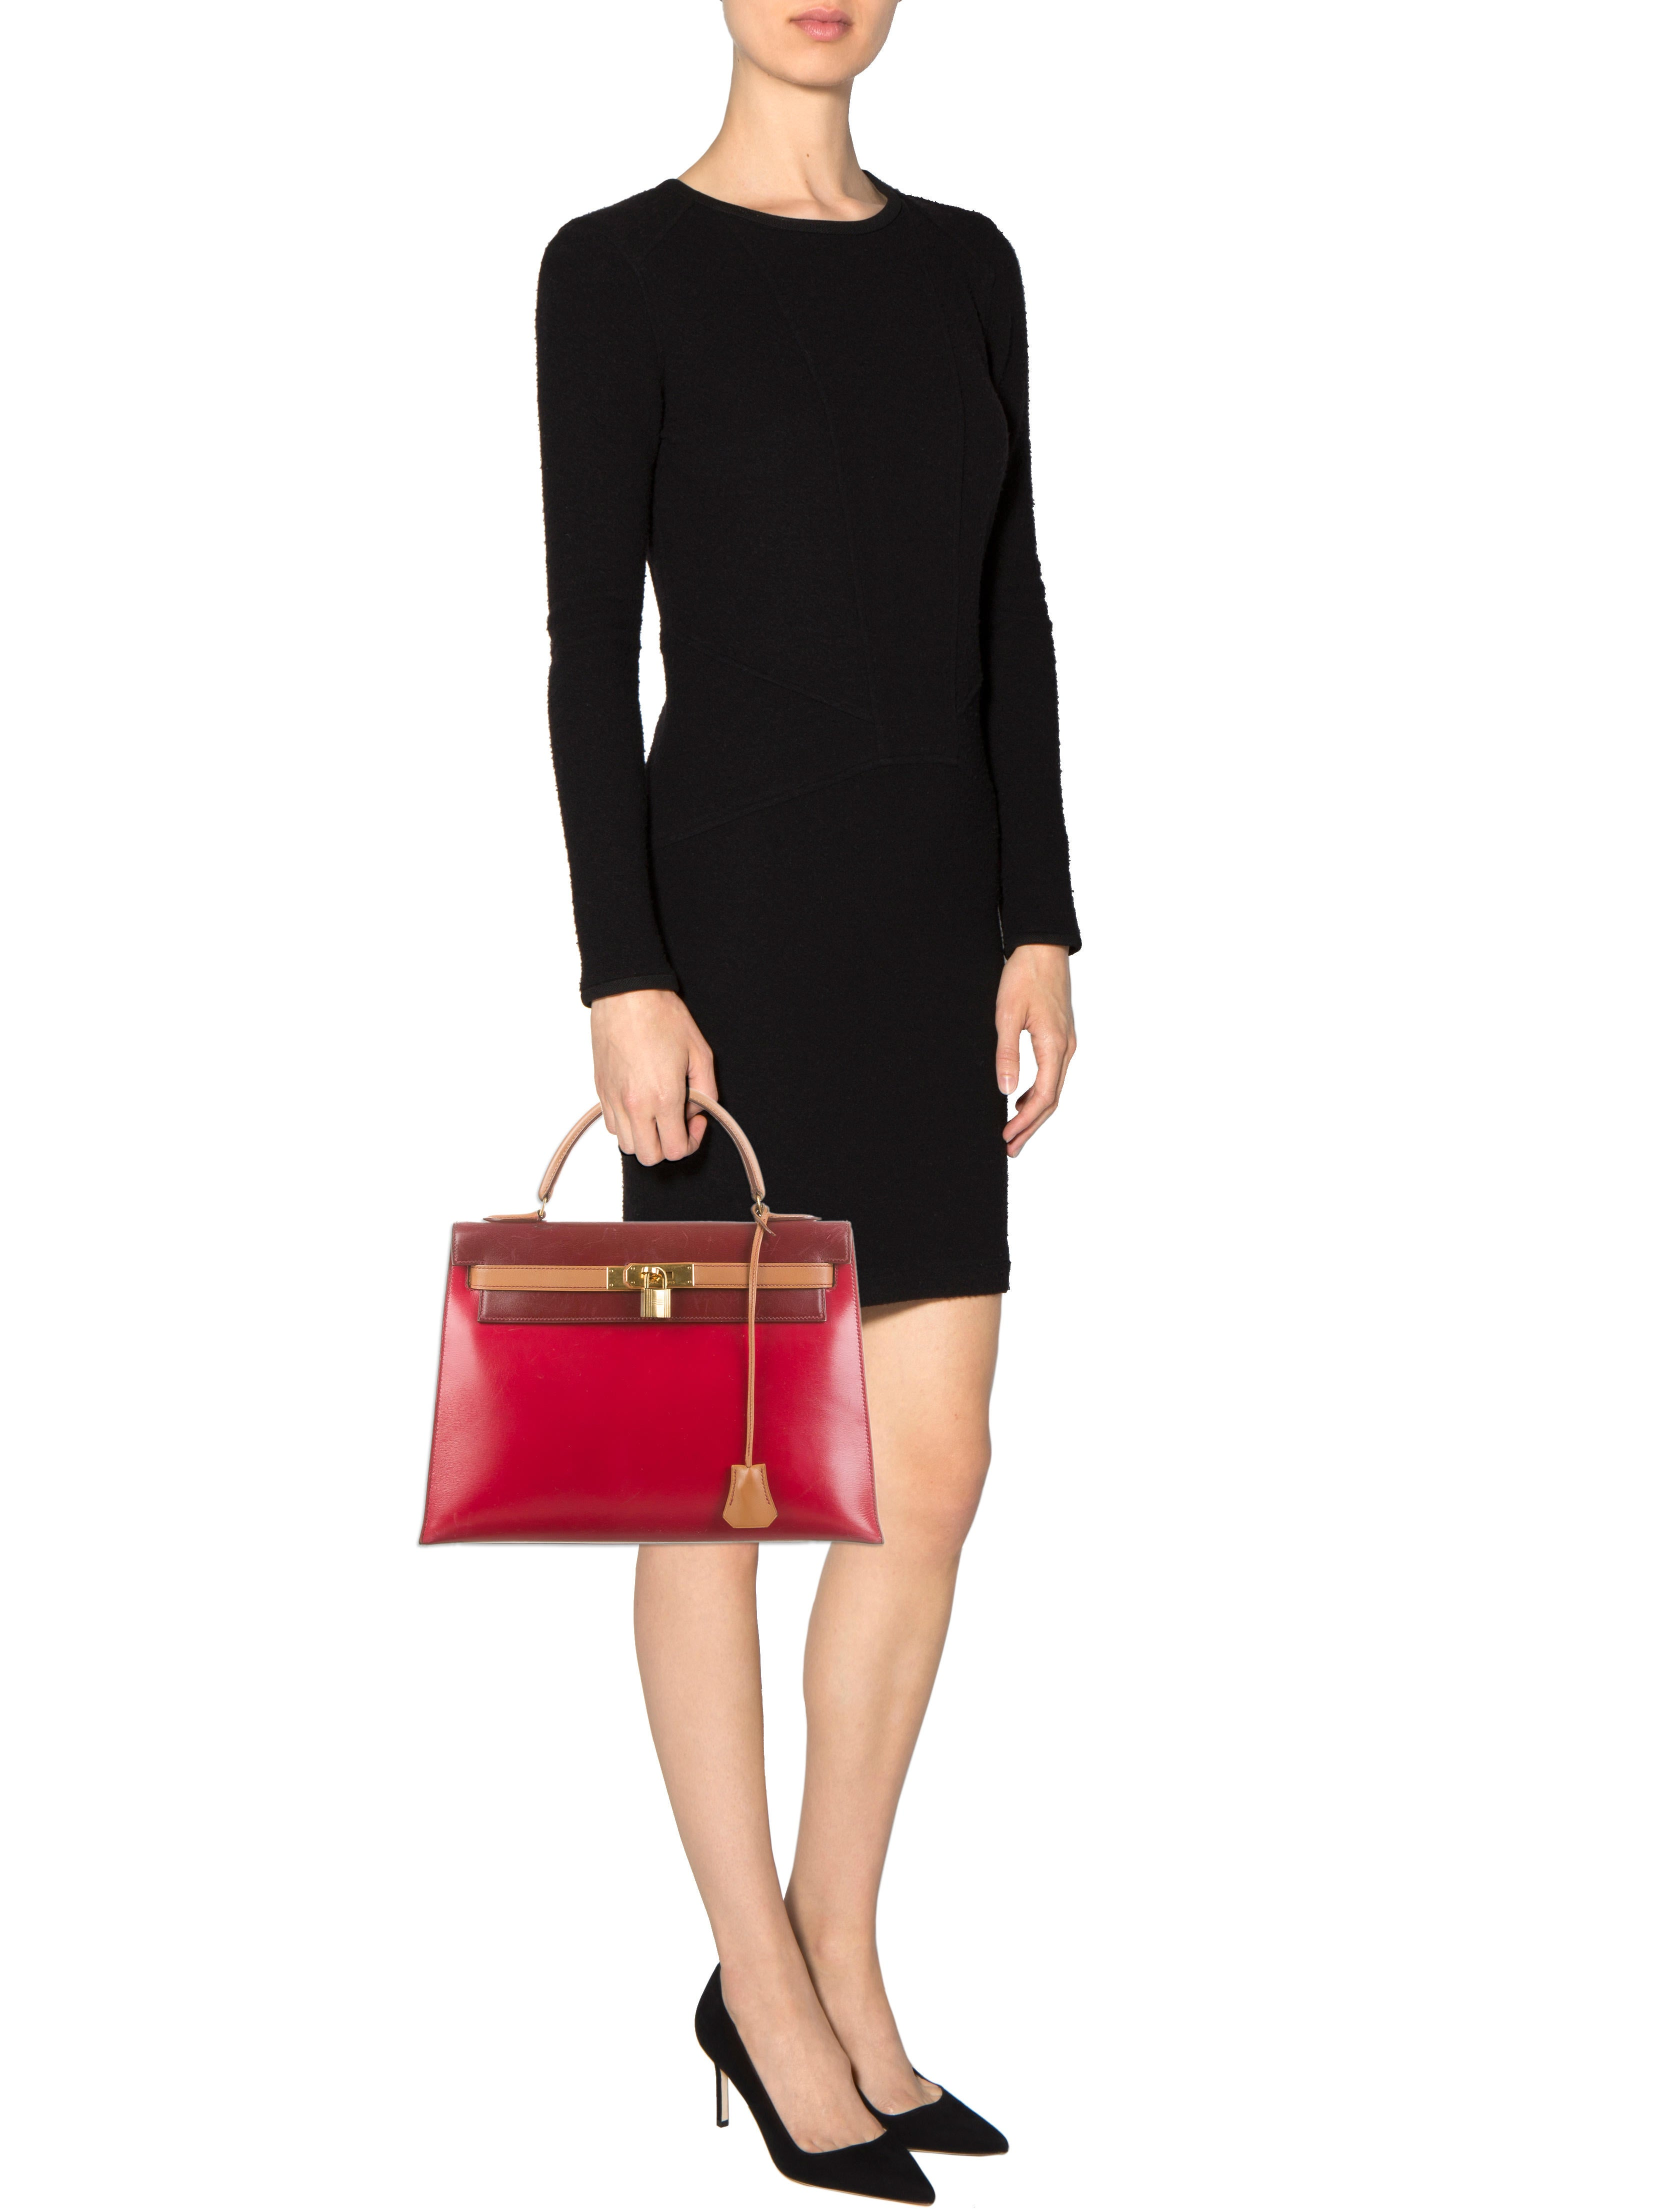 hermes paris handbags - hermes tri-color box leather sellier kelly 28cm, hermes handbags ...